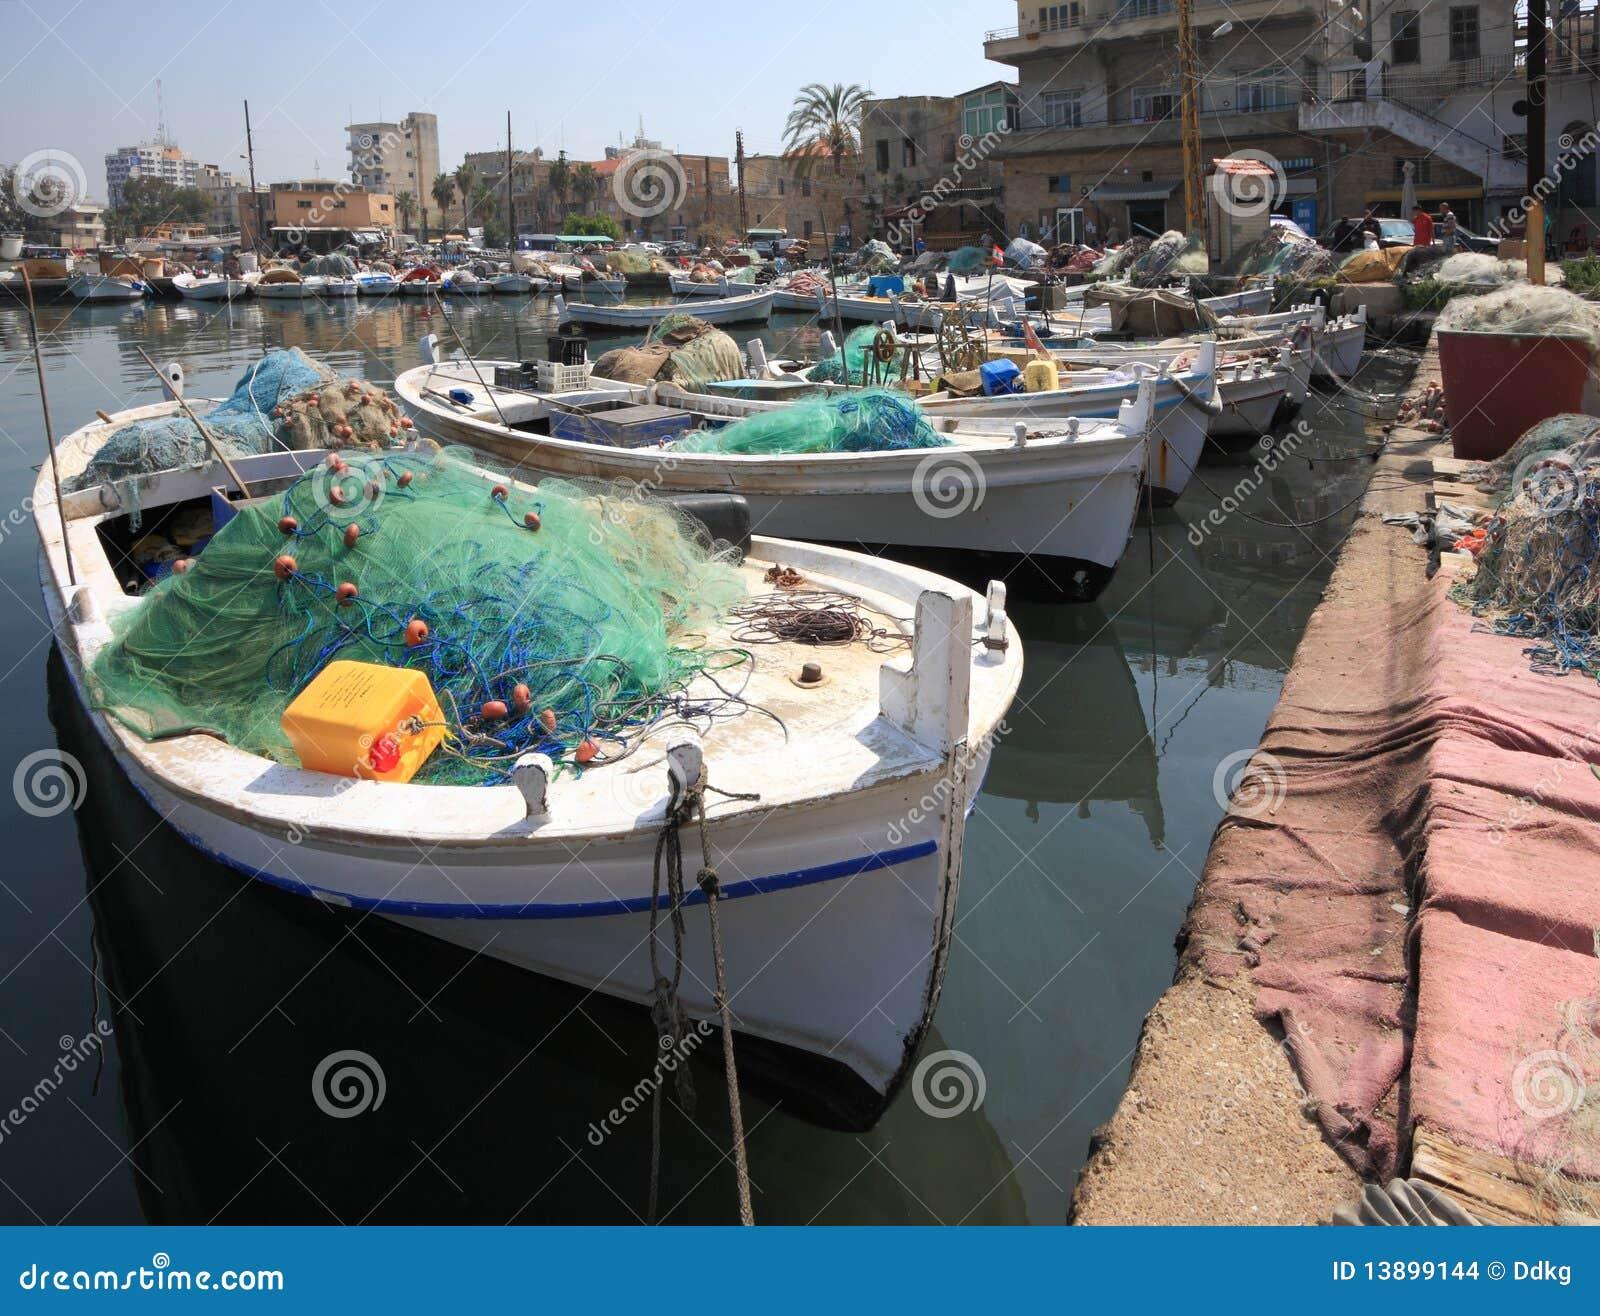 De Haven van de band, Libanon